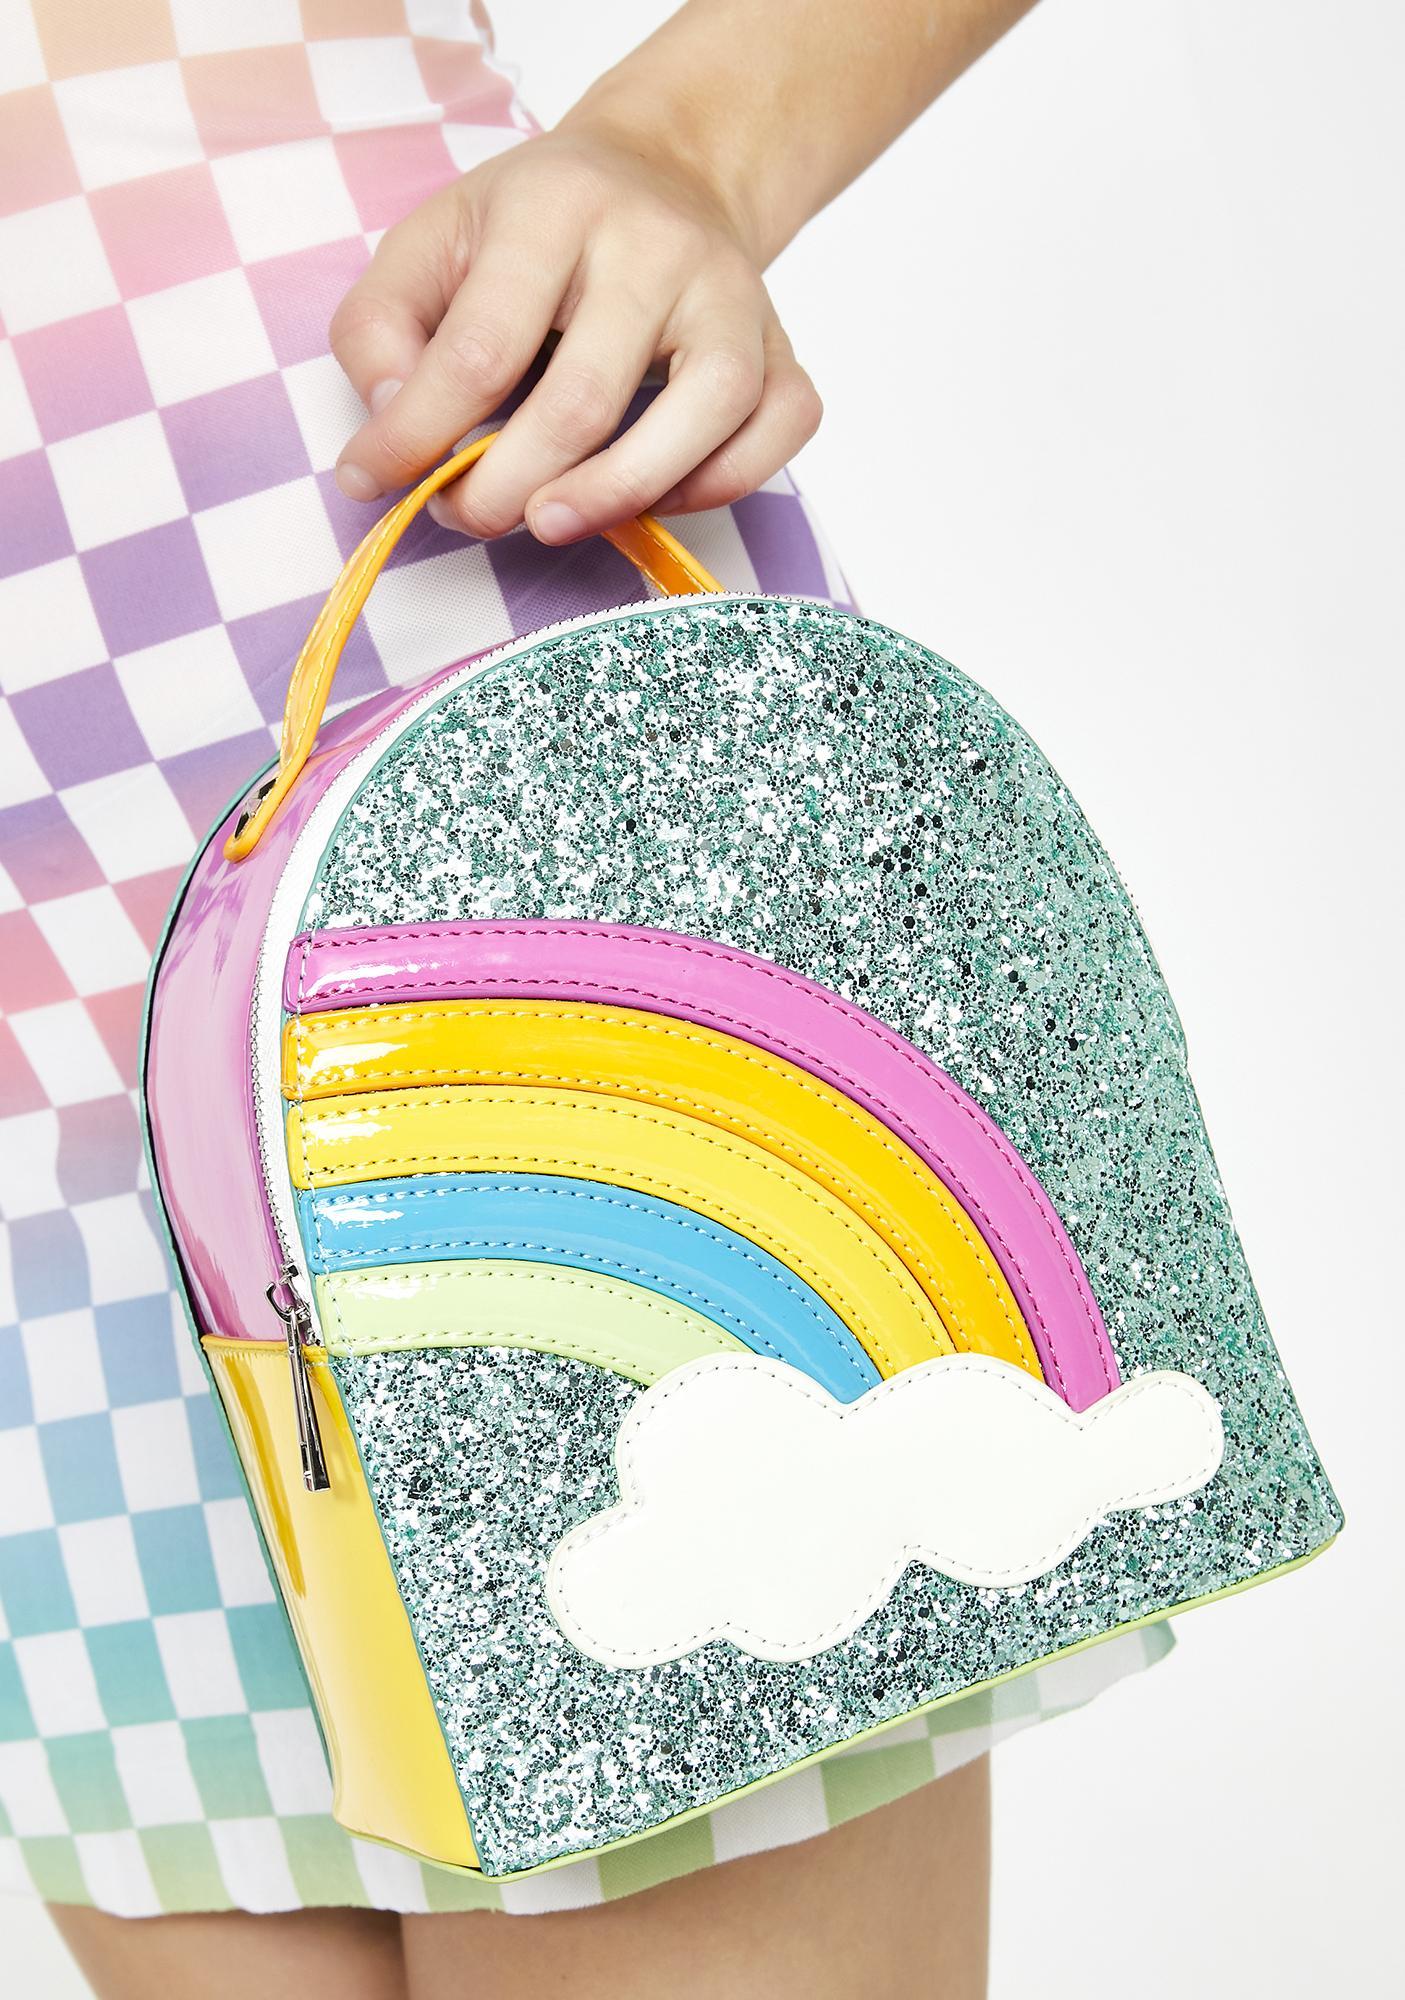 ... Sugar Thrillz Sparkle Rainbow Clique BFF Backpack ... 3b31eecbc0ded